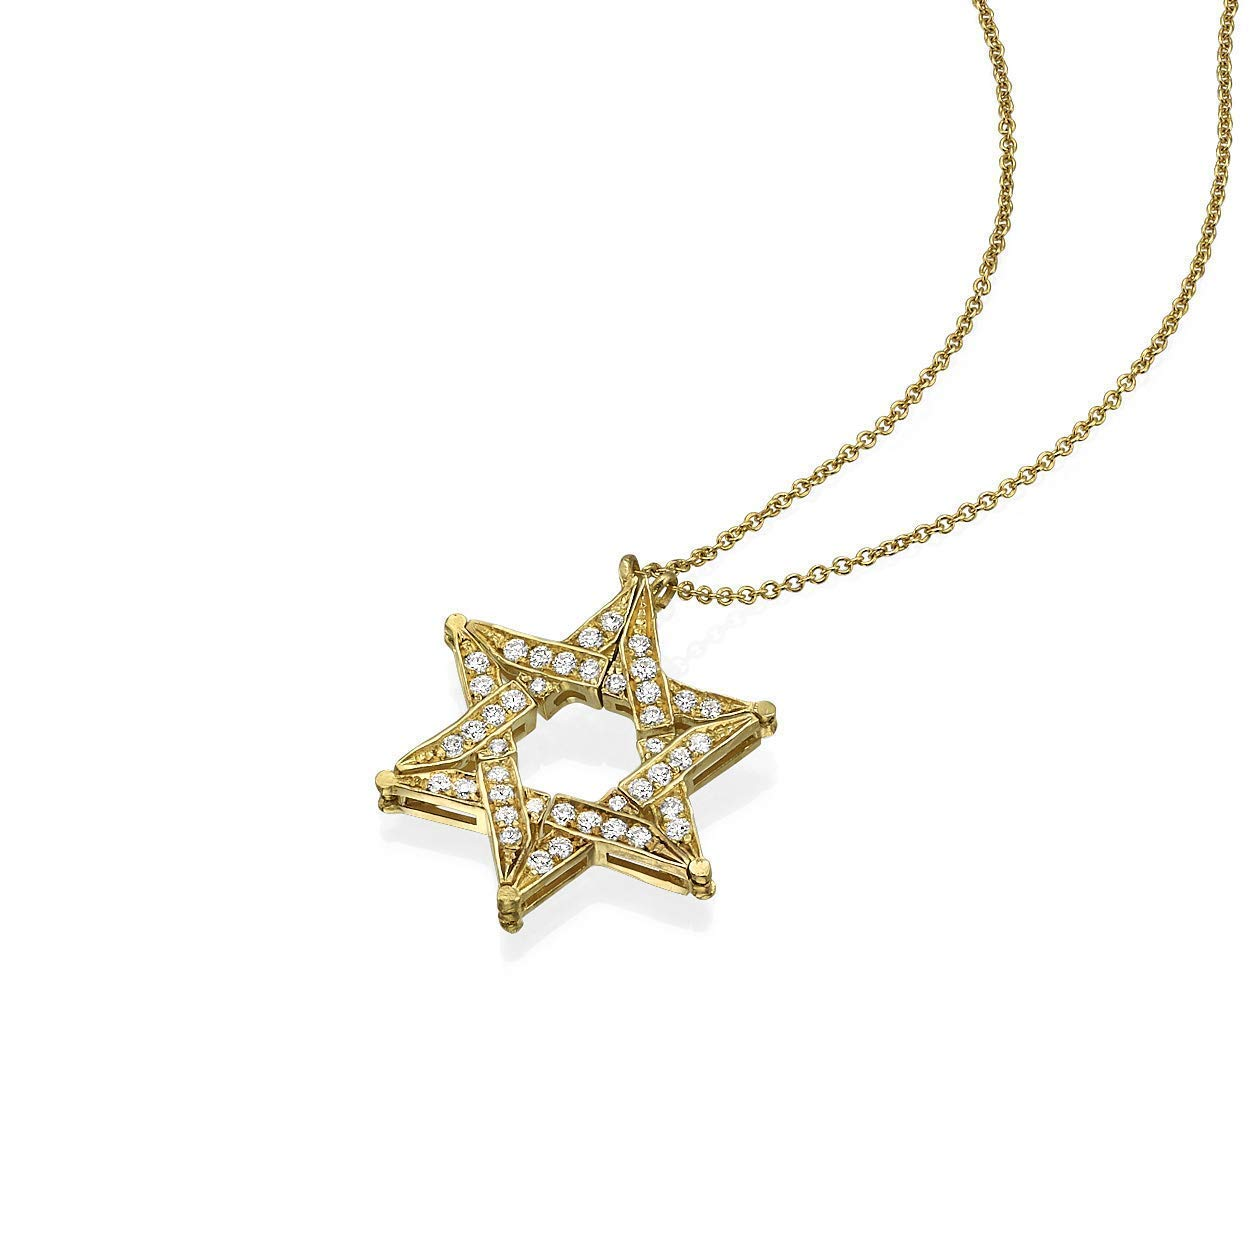 Diamond Pendant white gold Star of David 14K yellow gold pendant Judaica pendant Jewish Star of David gold /& diamonds pendant